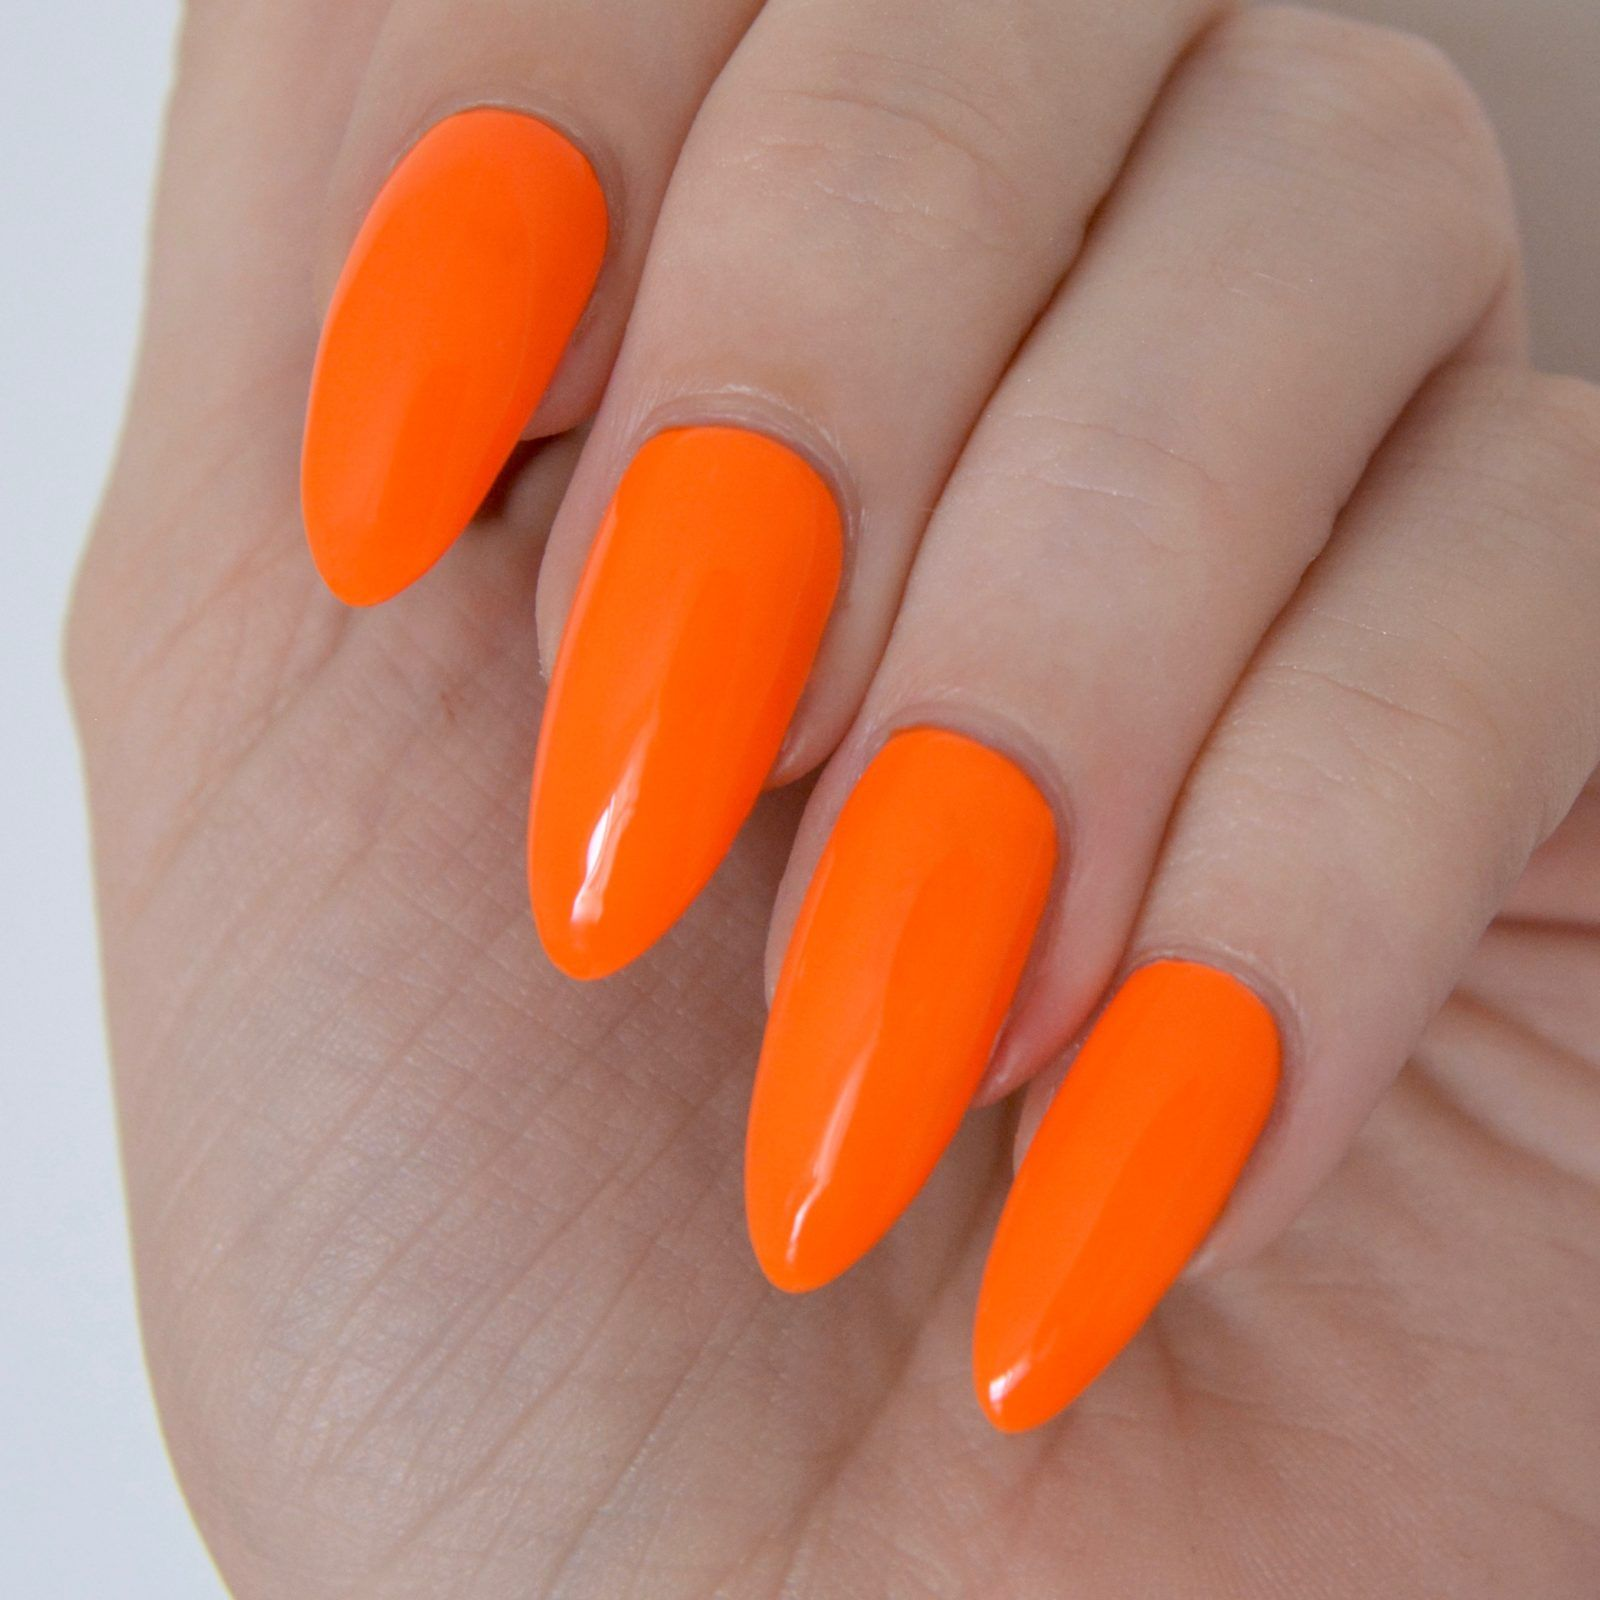 Essie Neon 2017 Review With Swatches | Neon orange nails, Orange ...